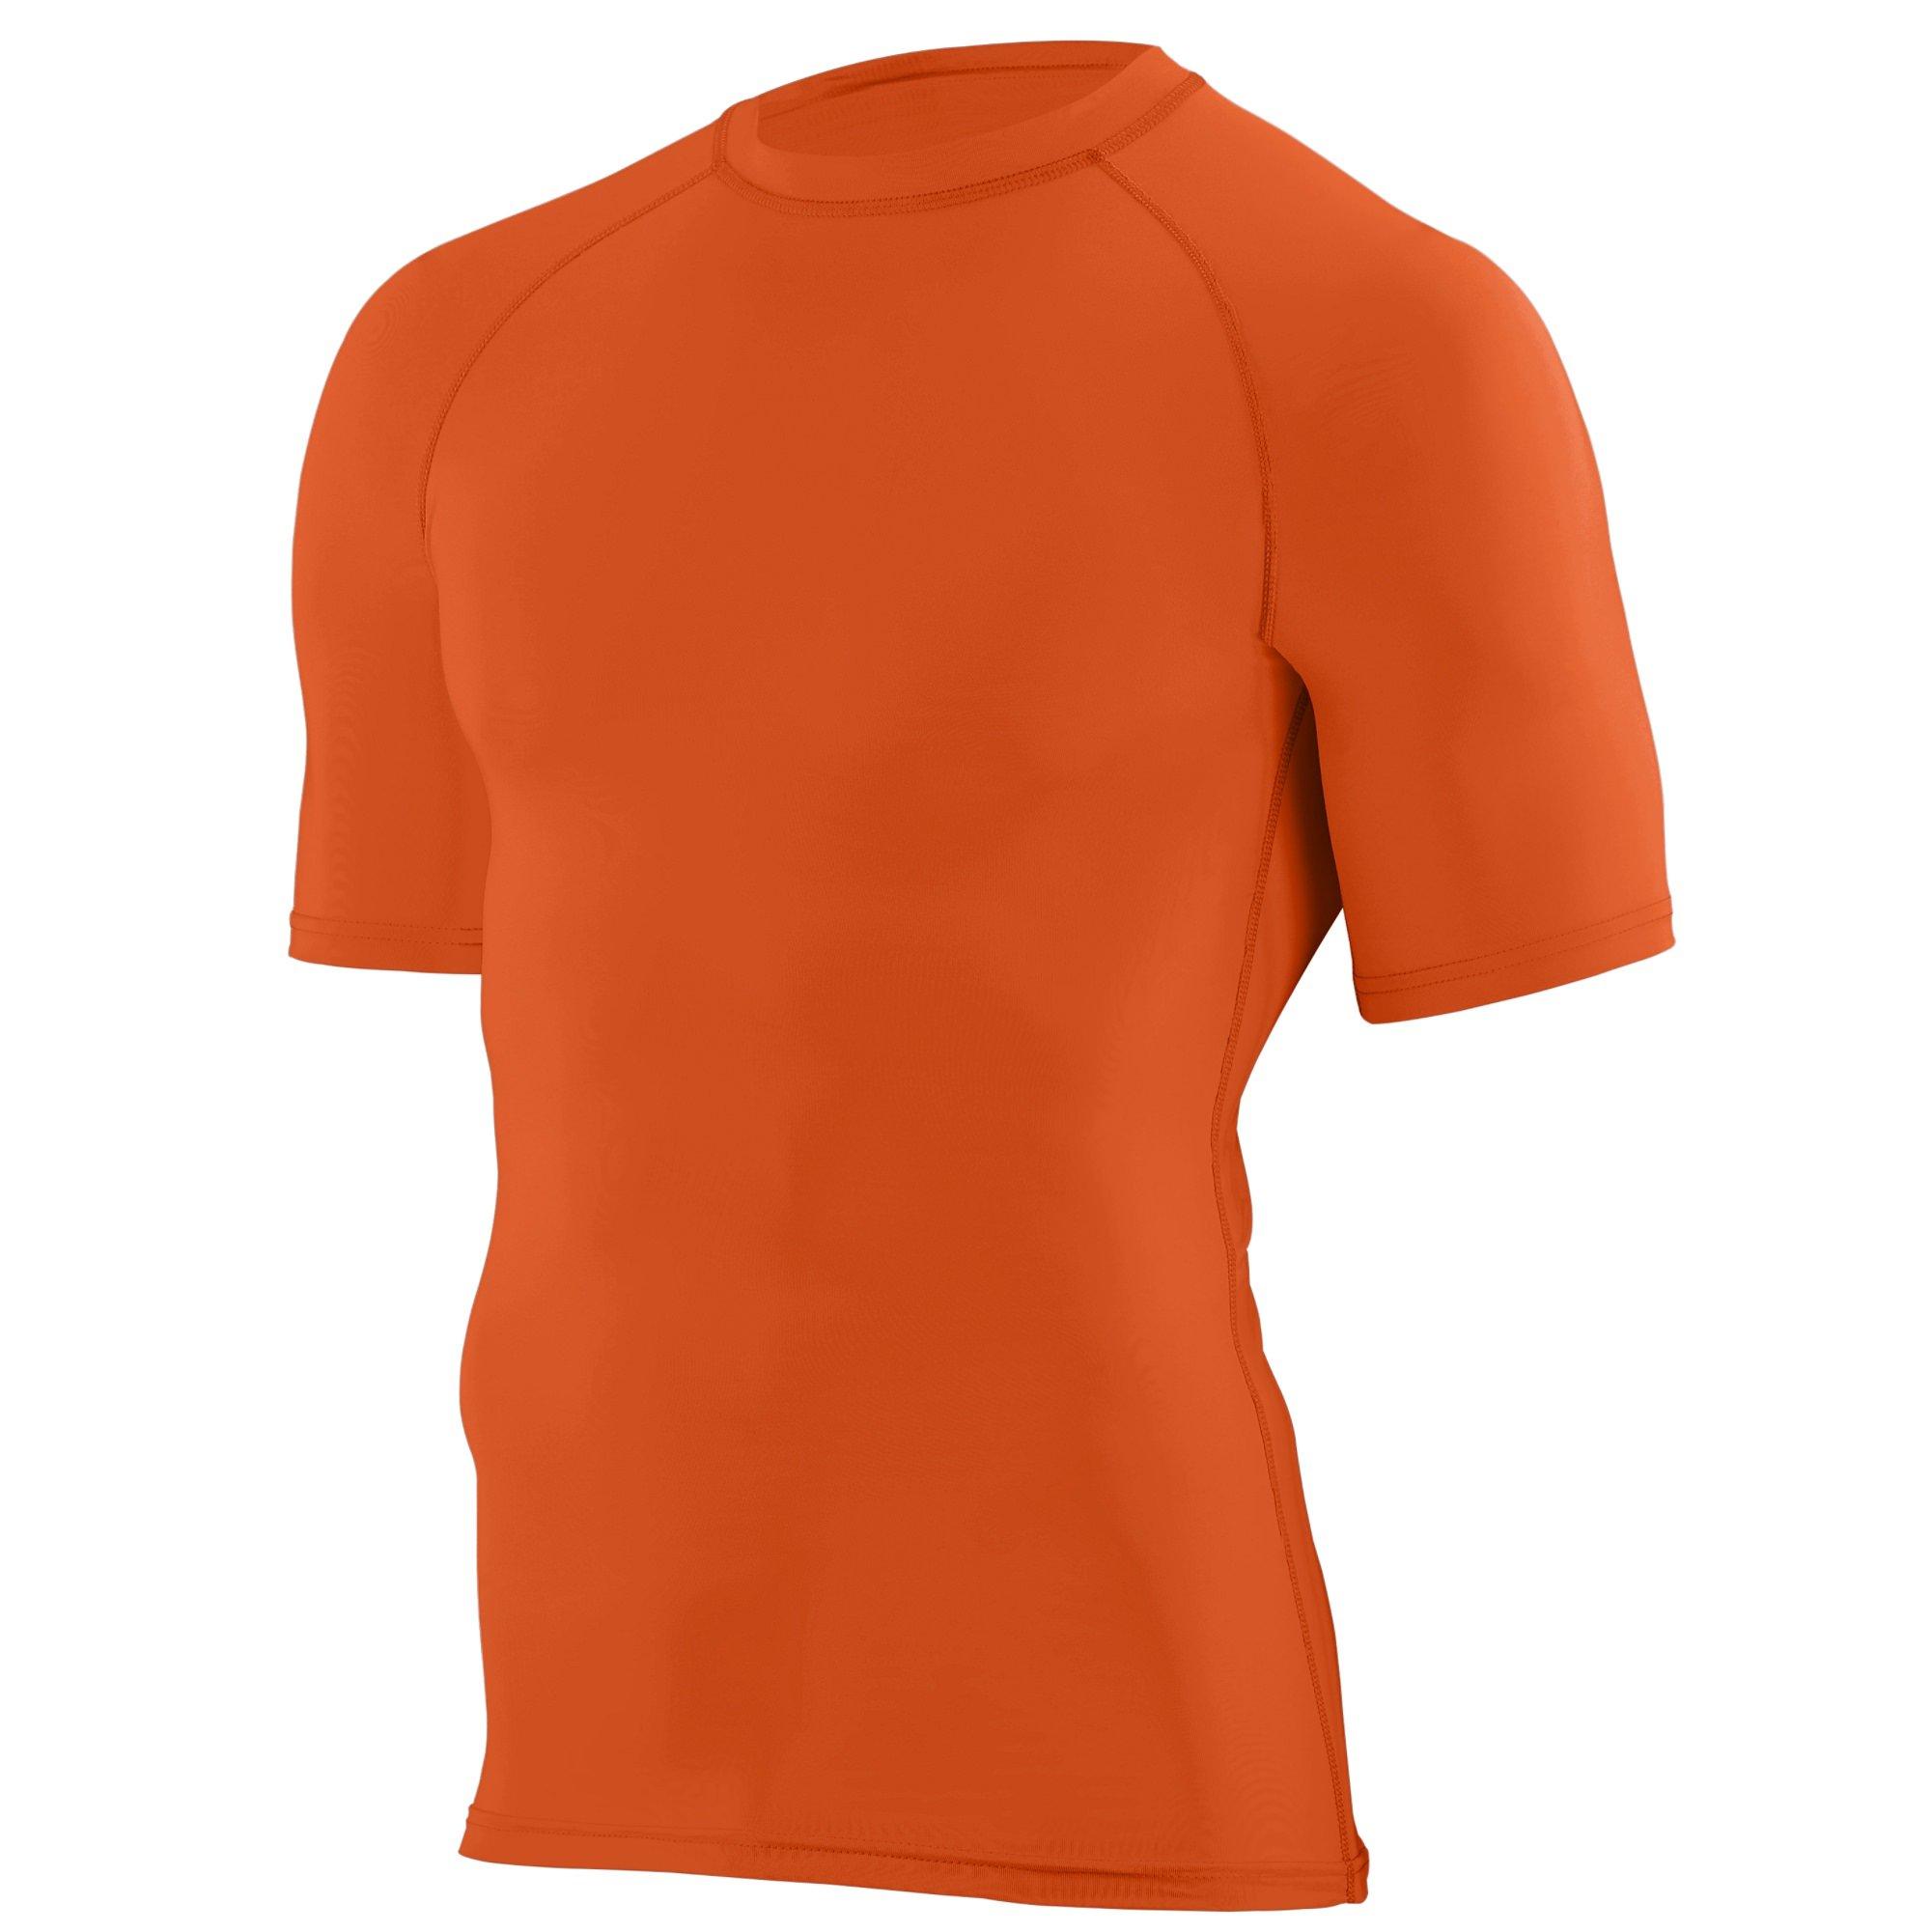 Augusta Sportswear Augusta Youth Hyperform Compression Short Sleeve Shirt, Orange, Small